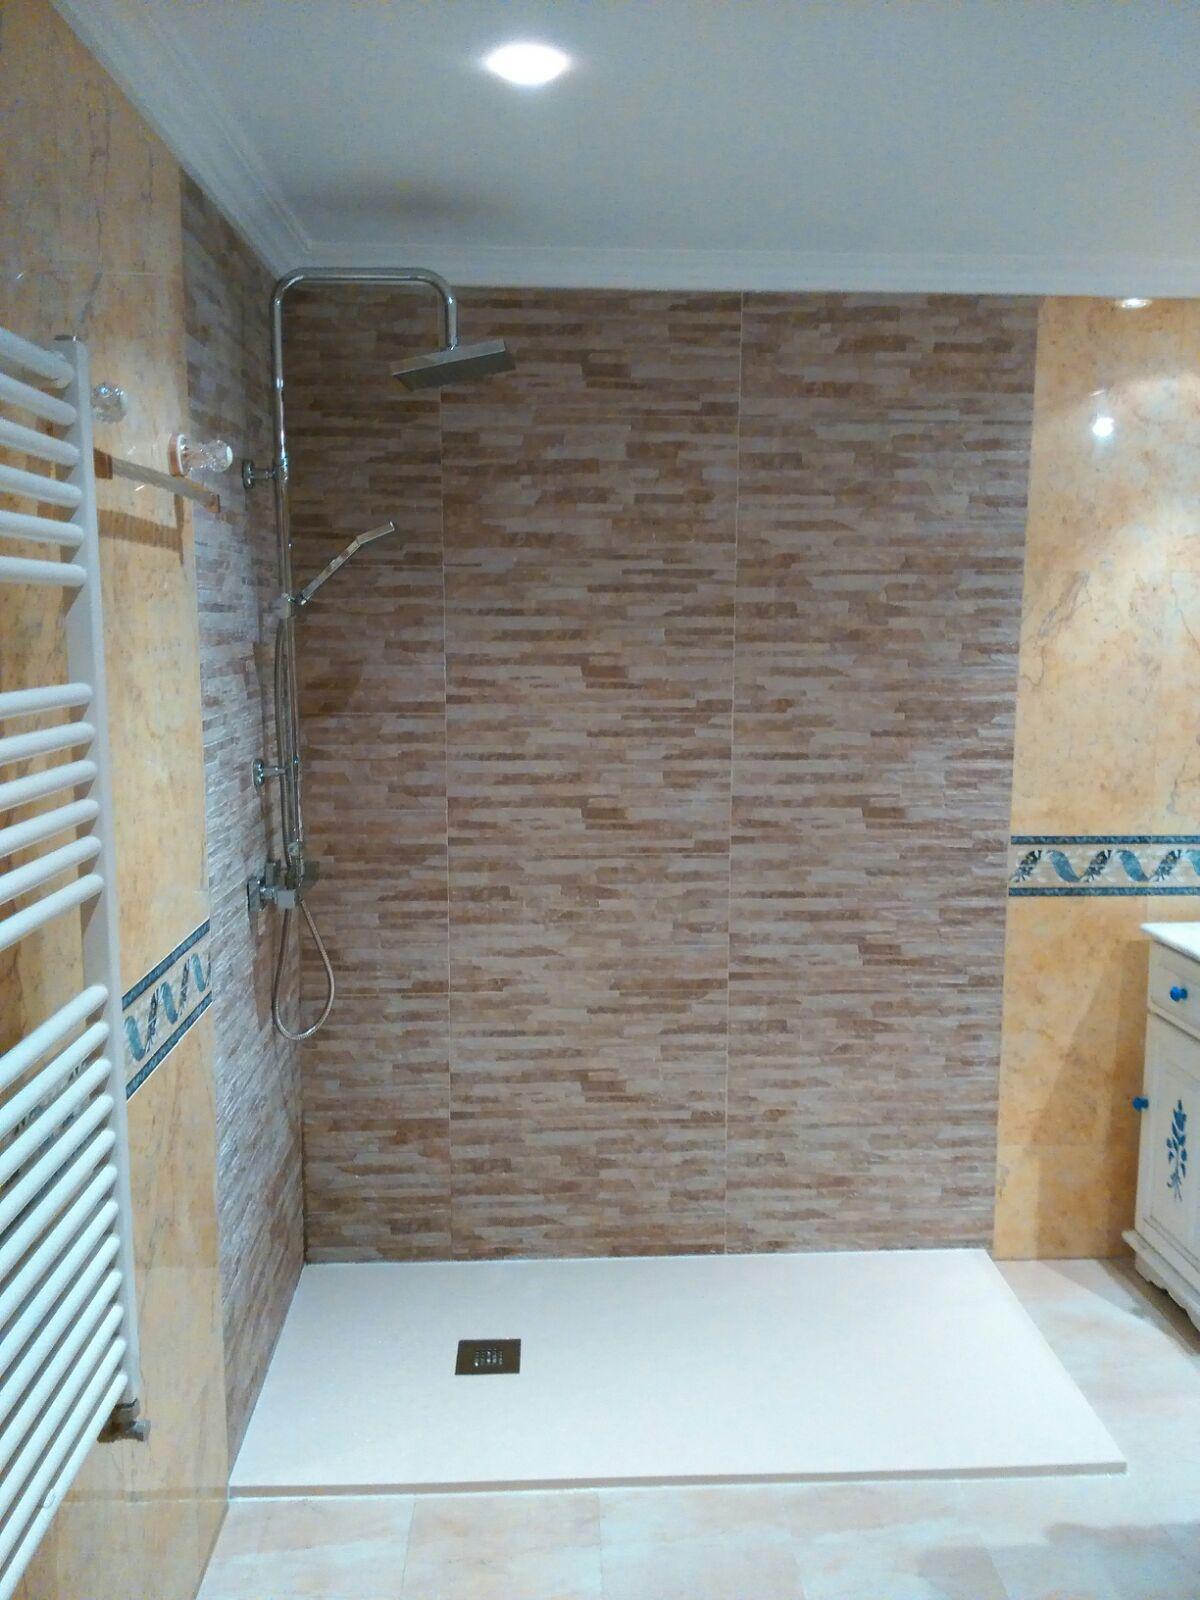 Cambio ba era por plato de ducha refor go - Cambio de banera por plato de ducha sin obras ...